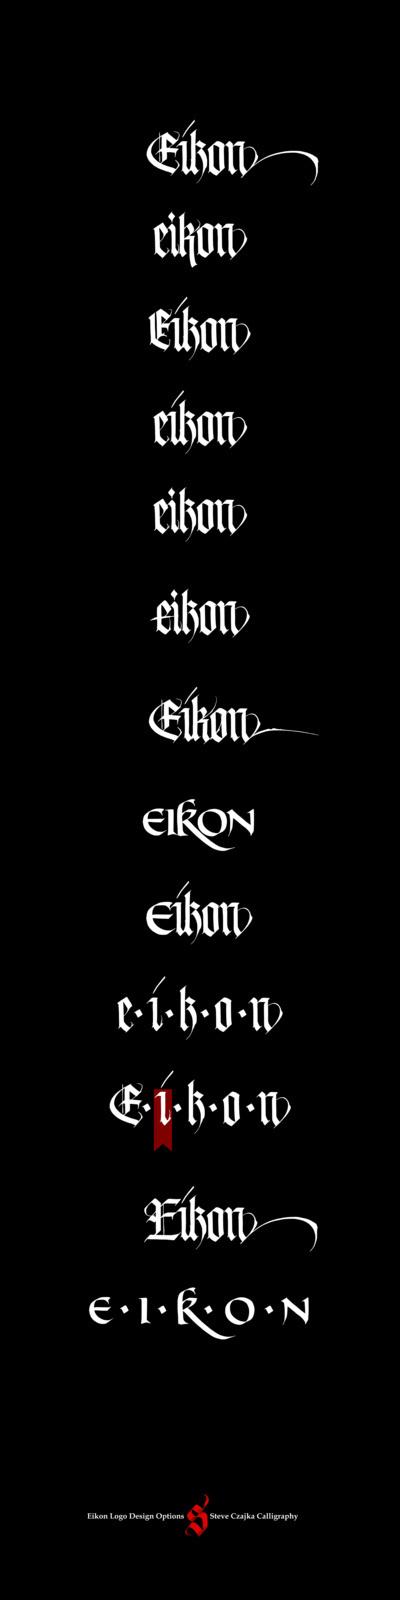 Eikon Design Group #truck #calligraphy #steve #lettering #business #guide #design #gothic #czajka #identity #manual #signs #logo #letterhead #cards